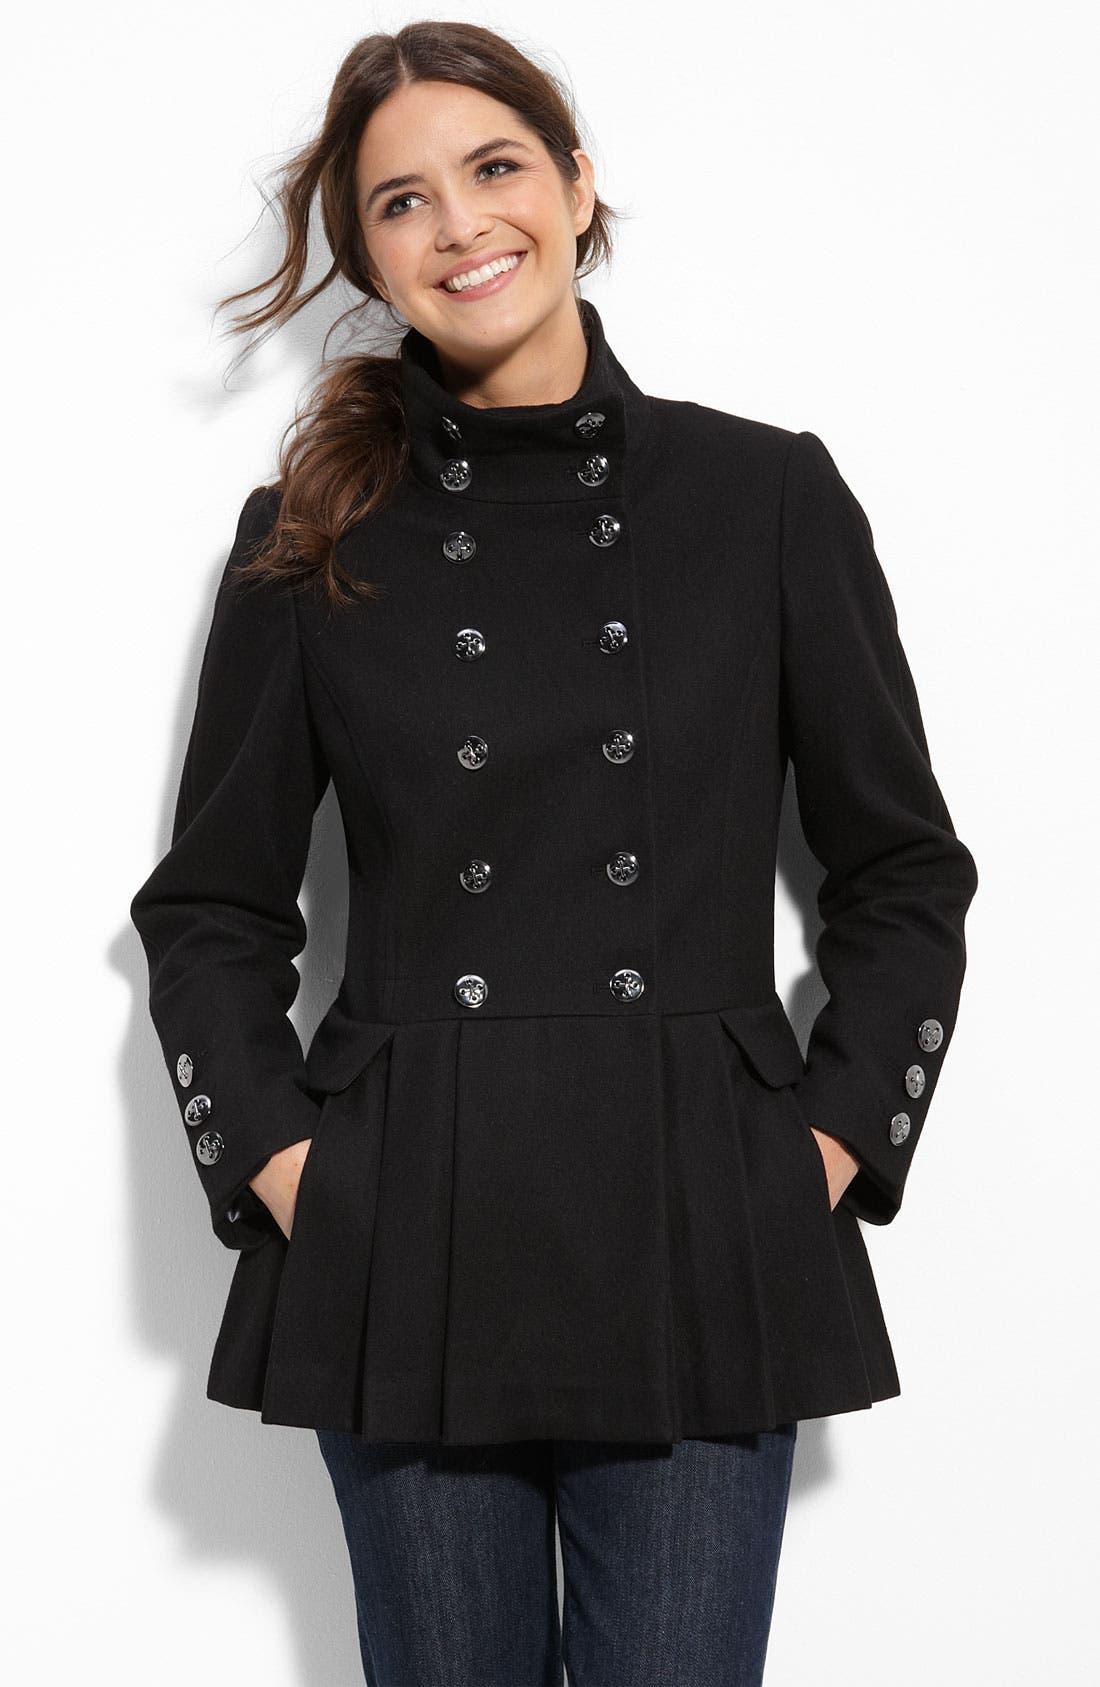 Alternate Image 1 Selected - Calvin Klein Military Inspired Wool Blend Coat